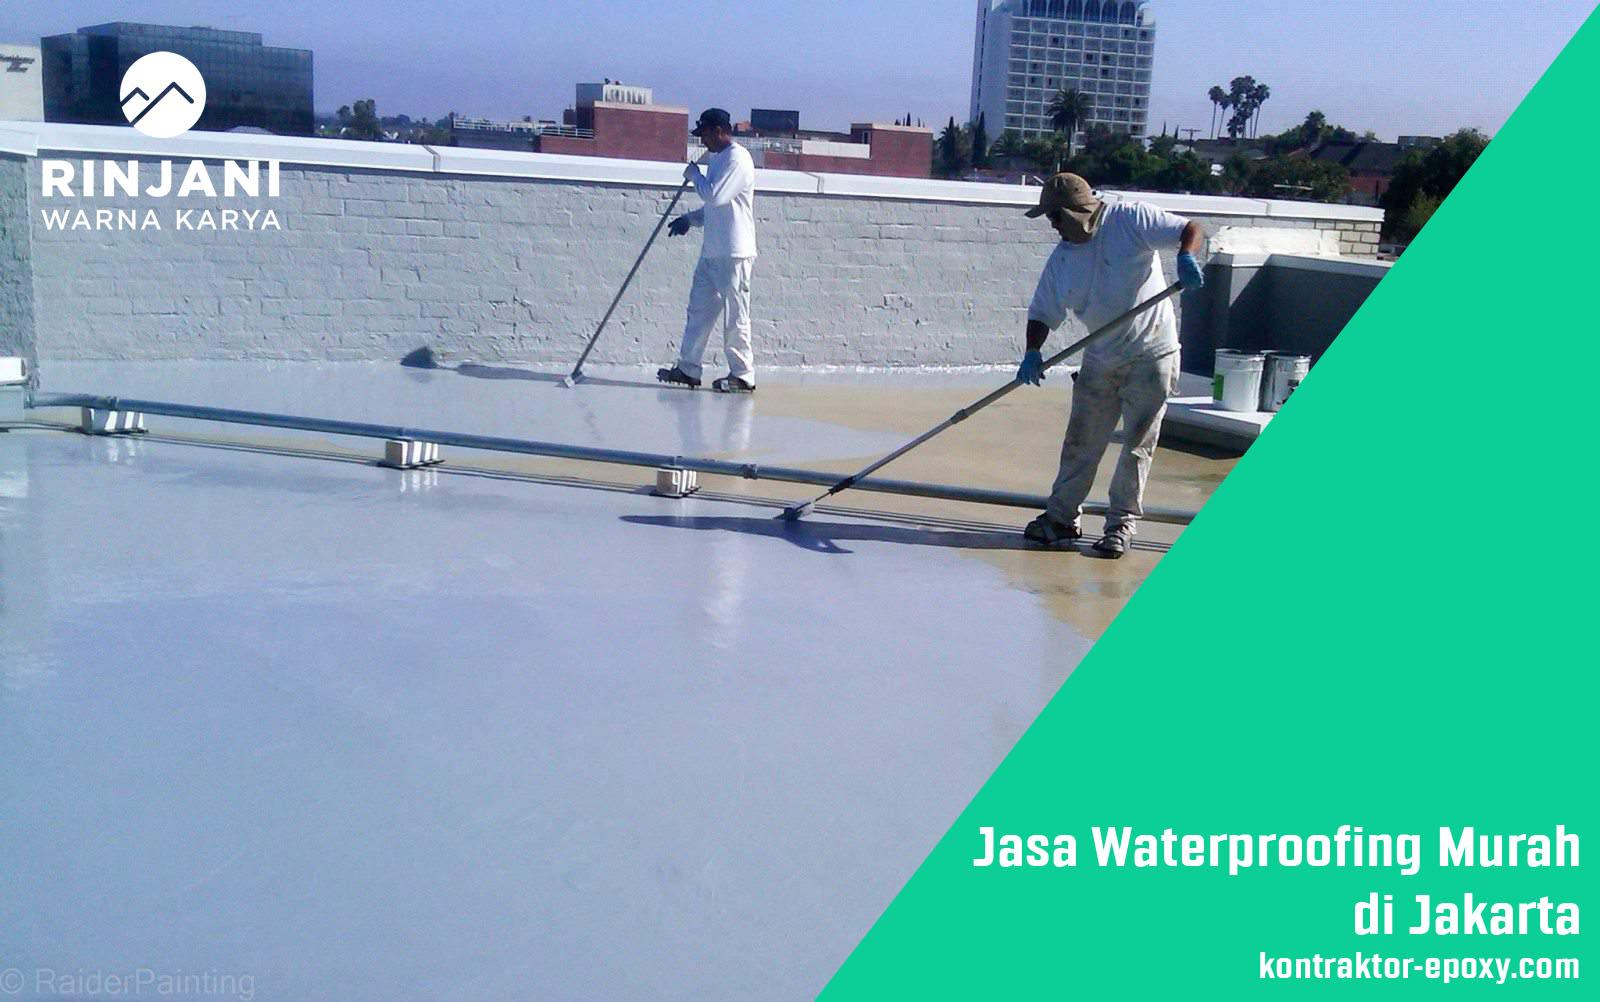 Jasa Waterproofing Murah Jakarta